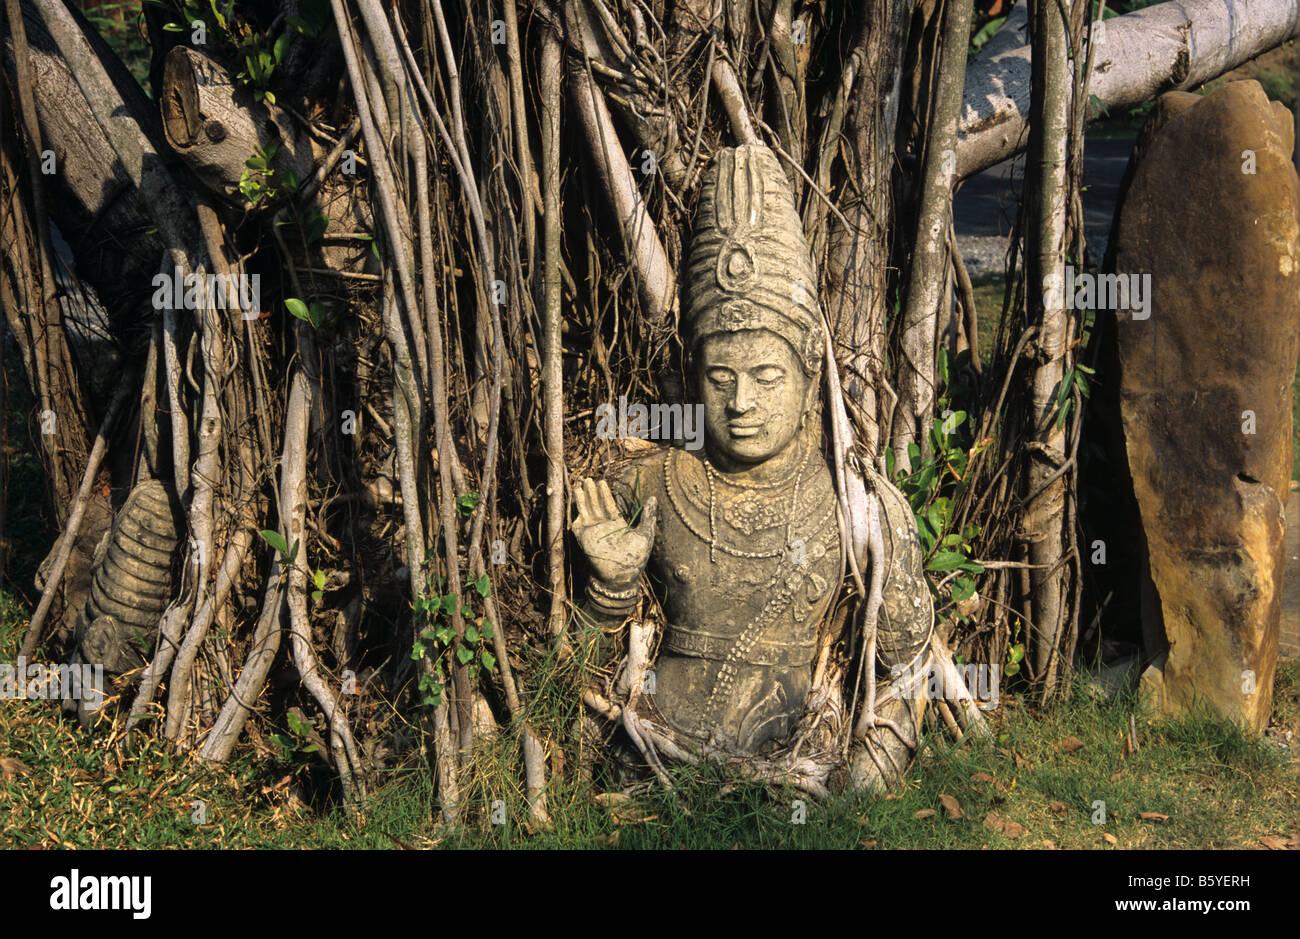 Hindu deity, Shiva, a c13-14th statue and banyan tree from Nakhon Si Thammarat, southern Thailand. Now at Ancient - Stock Image